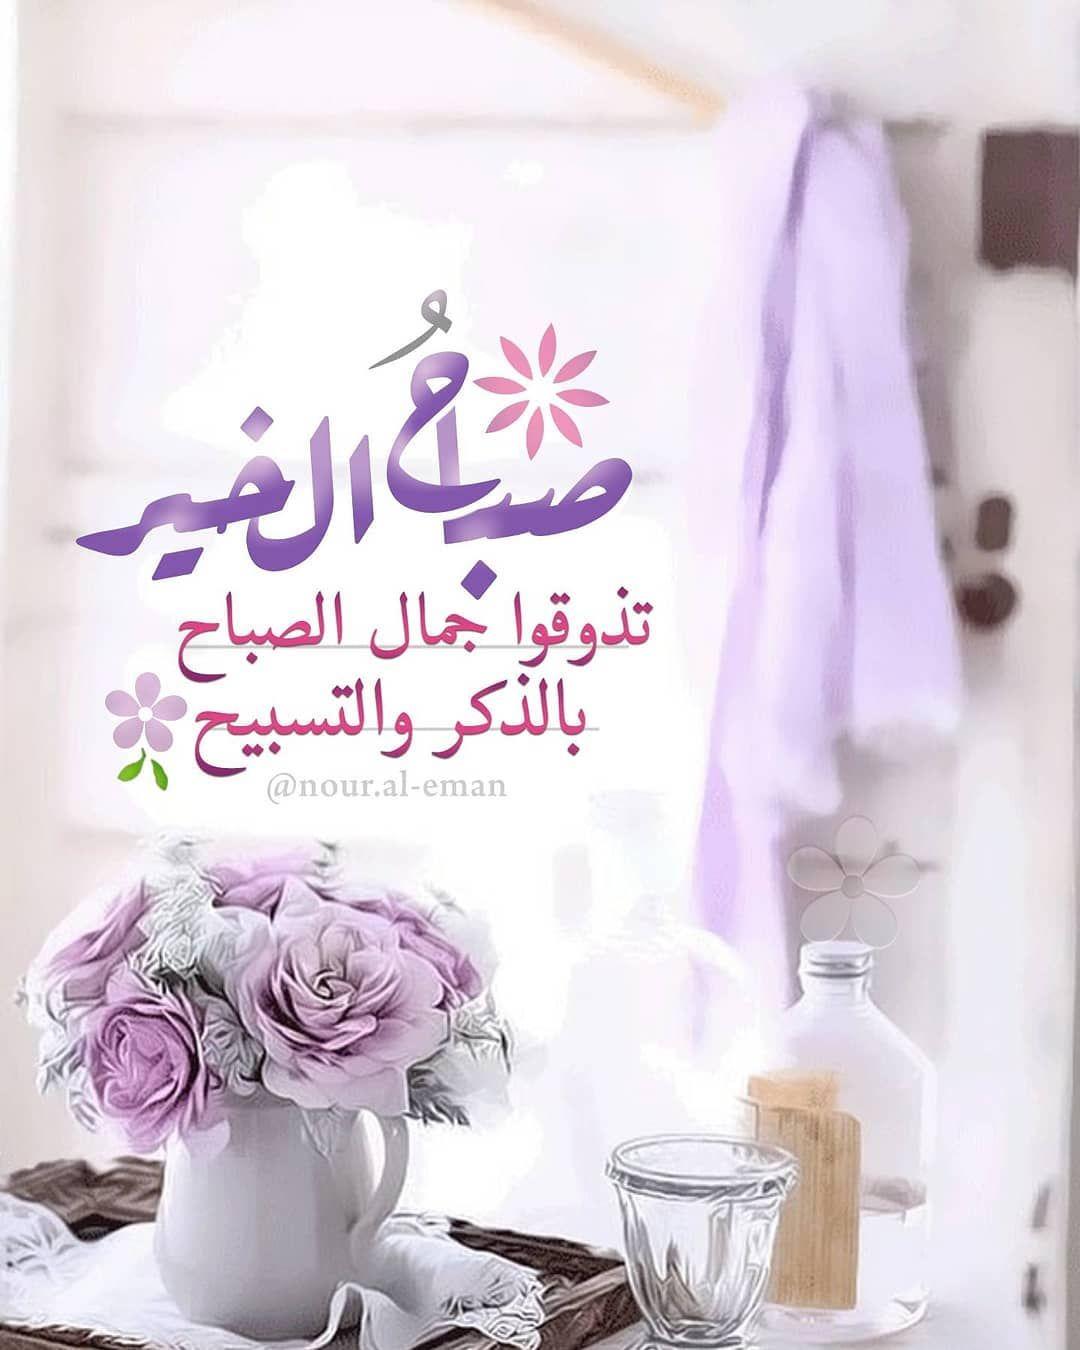 Pin By Ali Al Awad On صباح الخيرات والبركة Islamic Messages Beautiful Morning Morning Wish